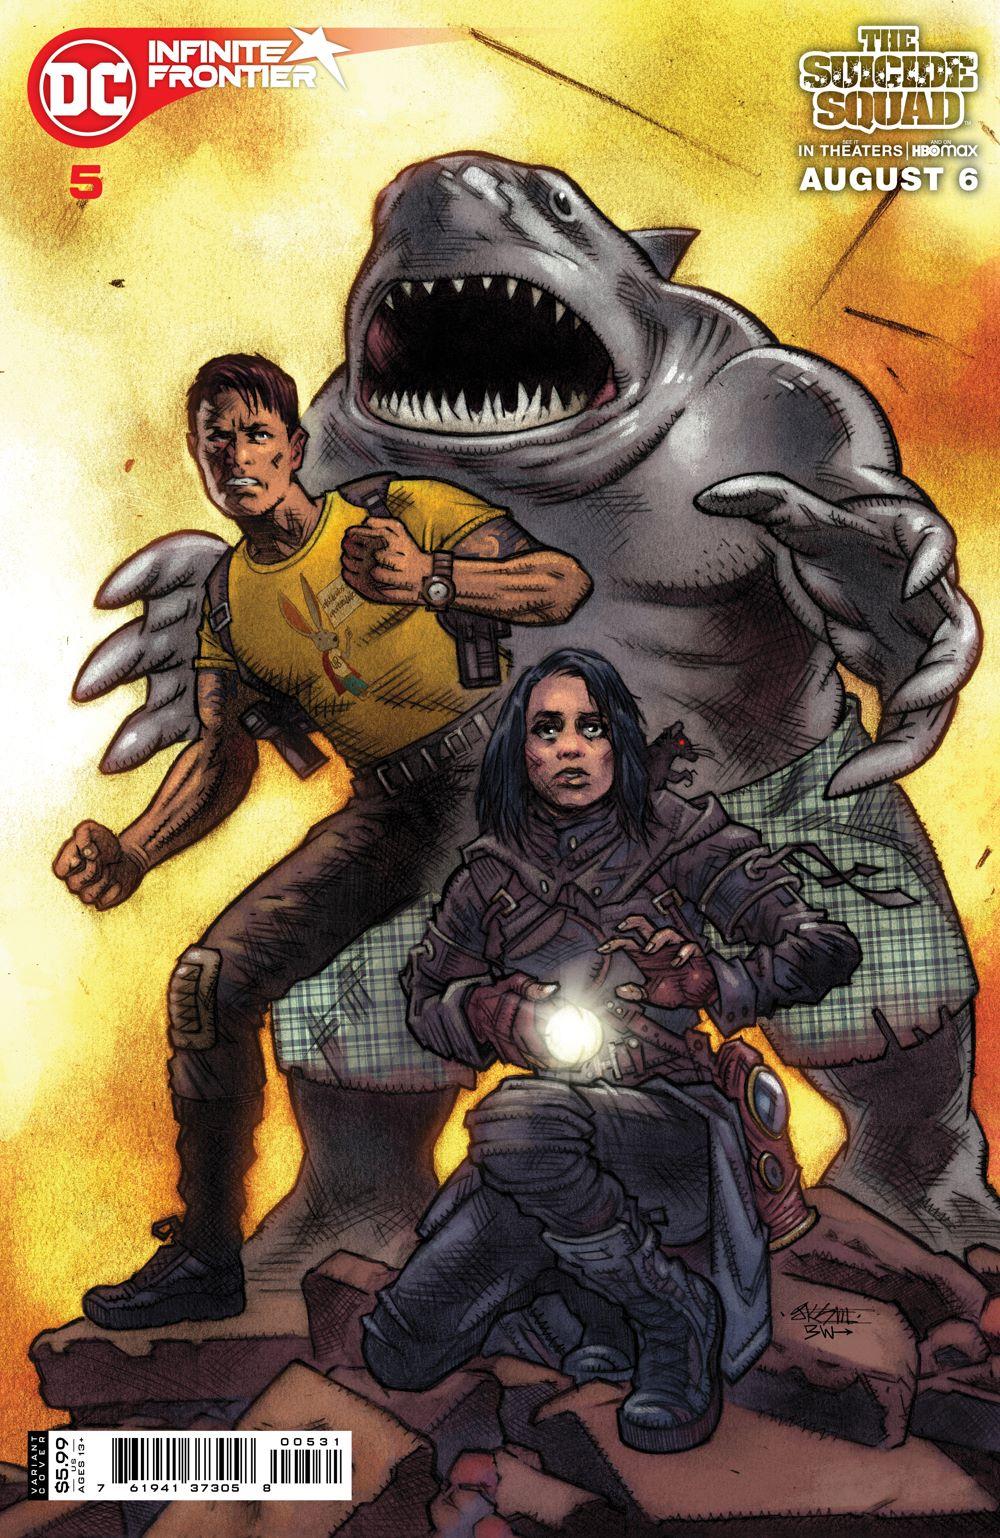 INFINITE_FRONTIER_Cv5_SSQUADMOVIE_var_00531 DC Comics August 2021 Solicitations